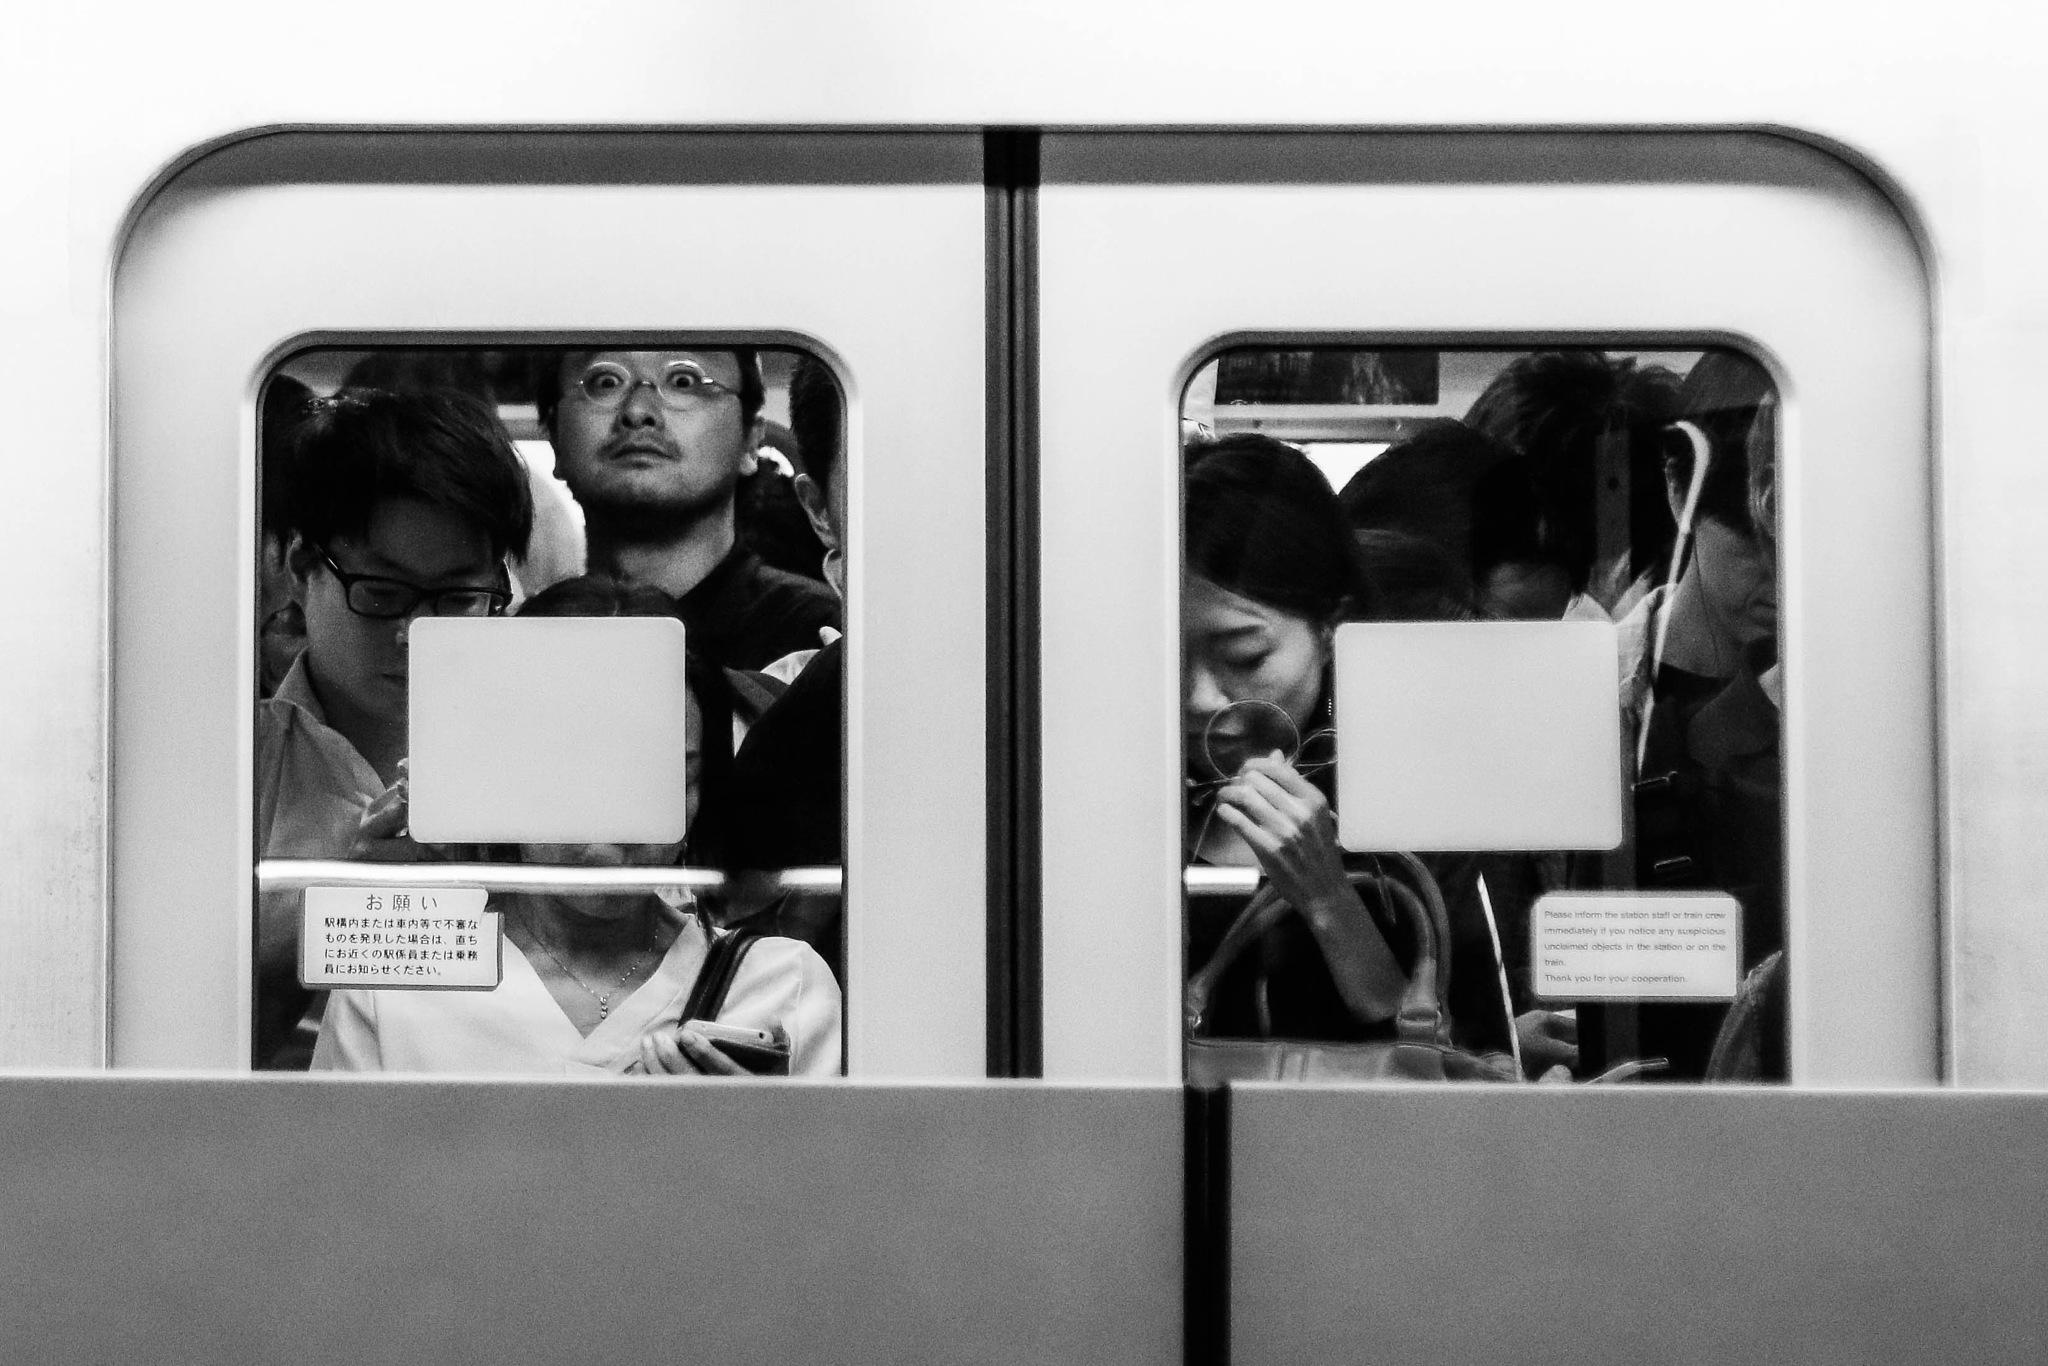 Rush hour by Stefania Tirella